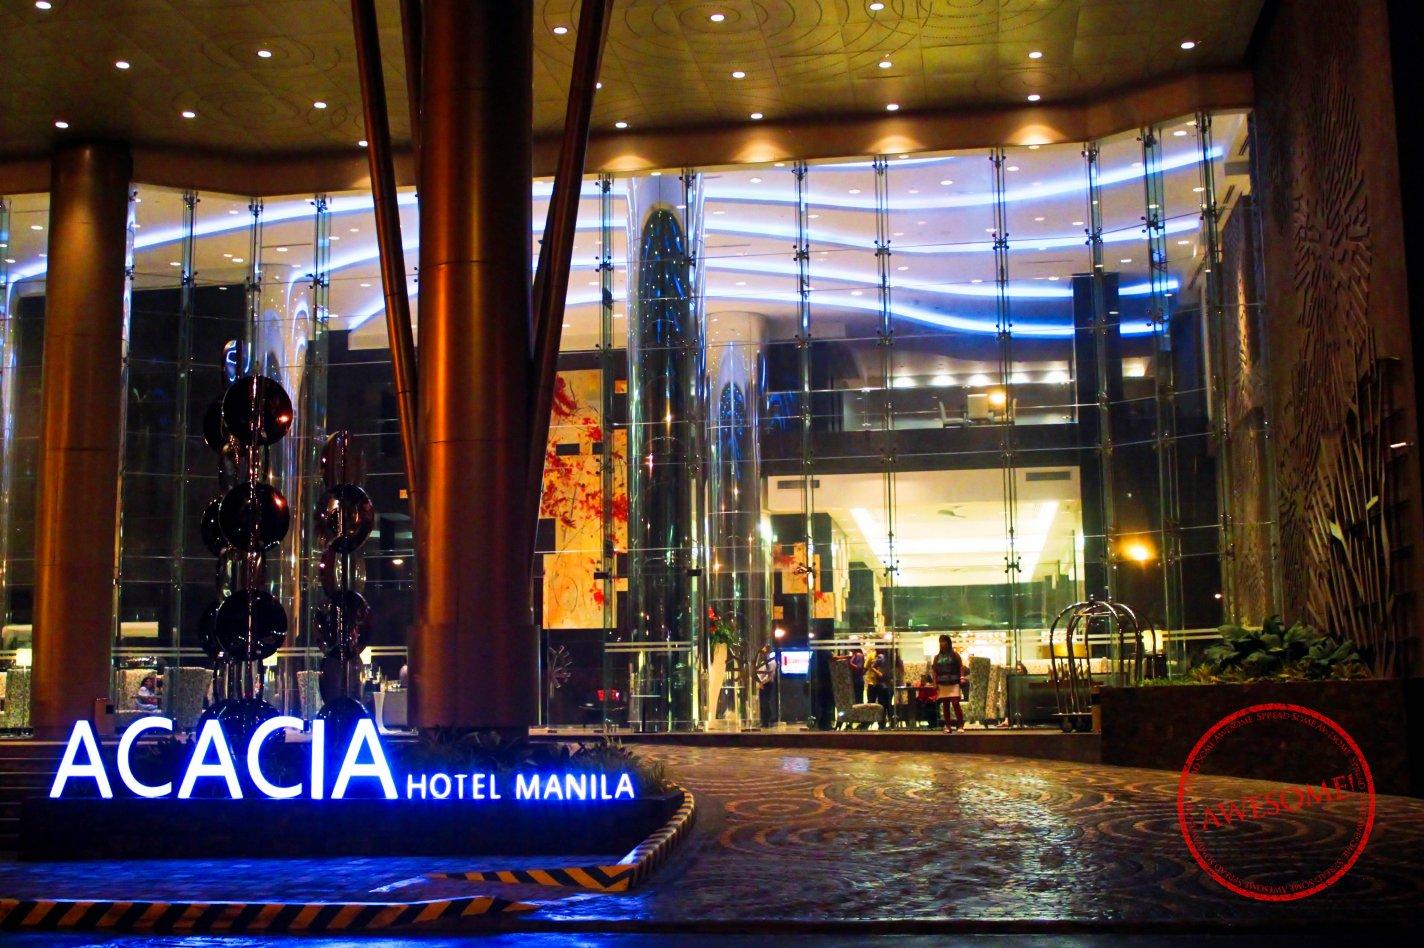 Millie Morales Acacia Hotel Manila Review